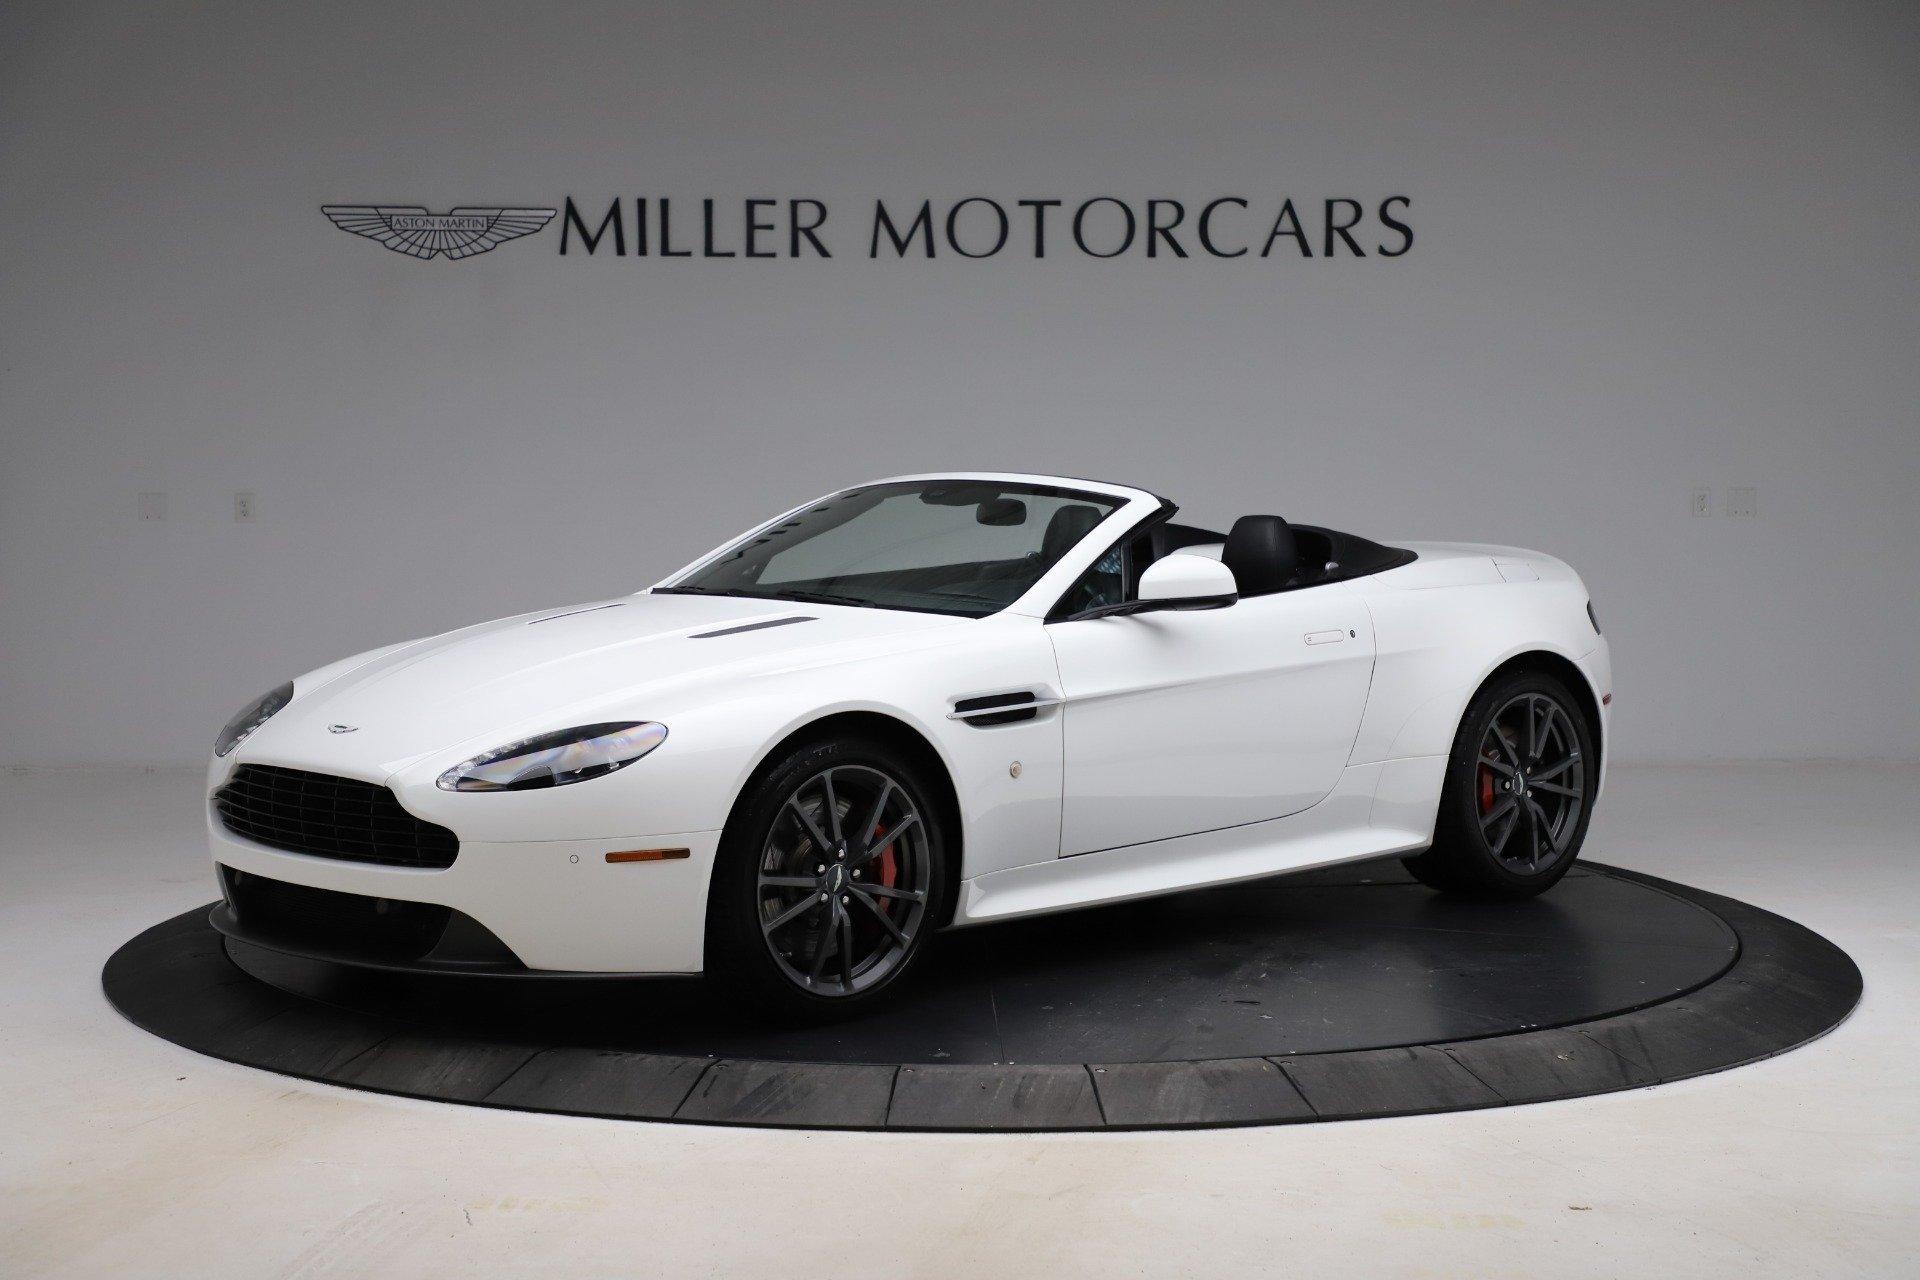 2015 Aston Martin V8 Vantage Gt Roadster Classic Driver Market